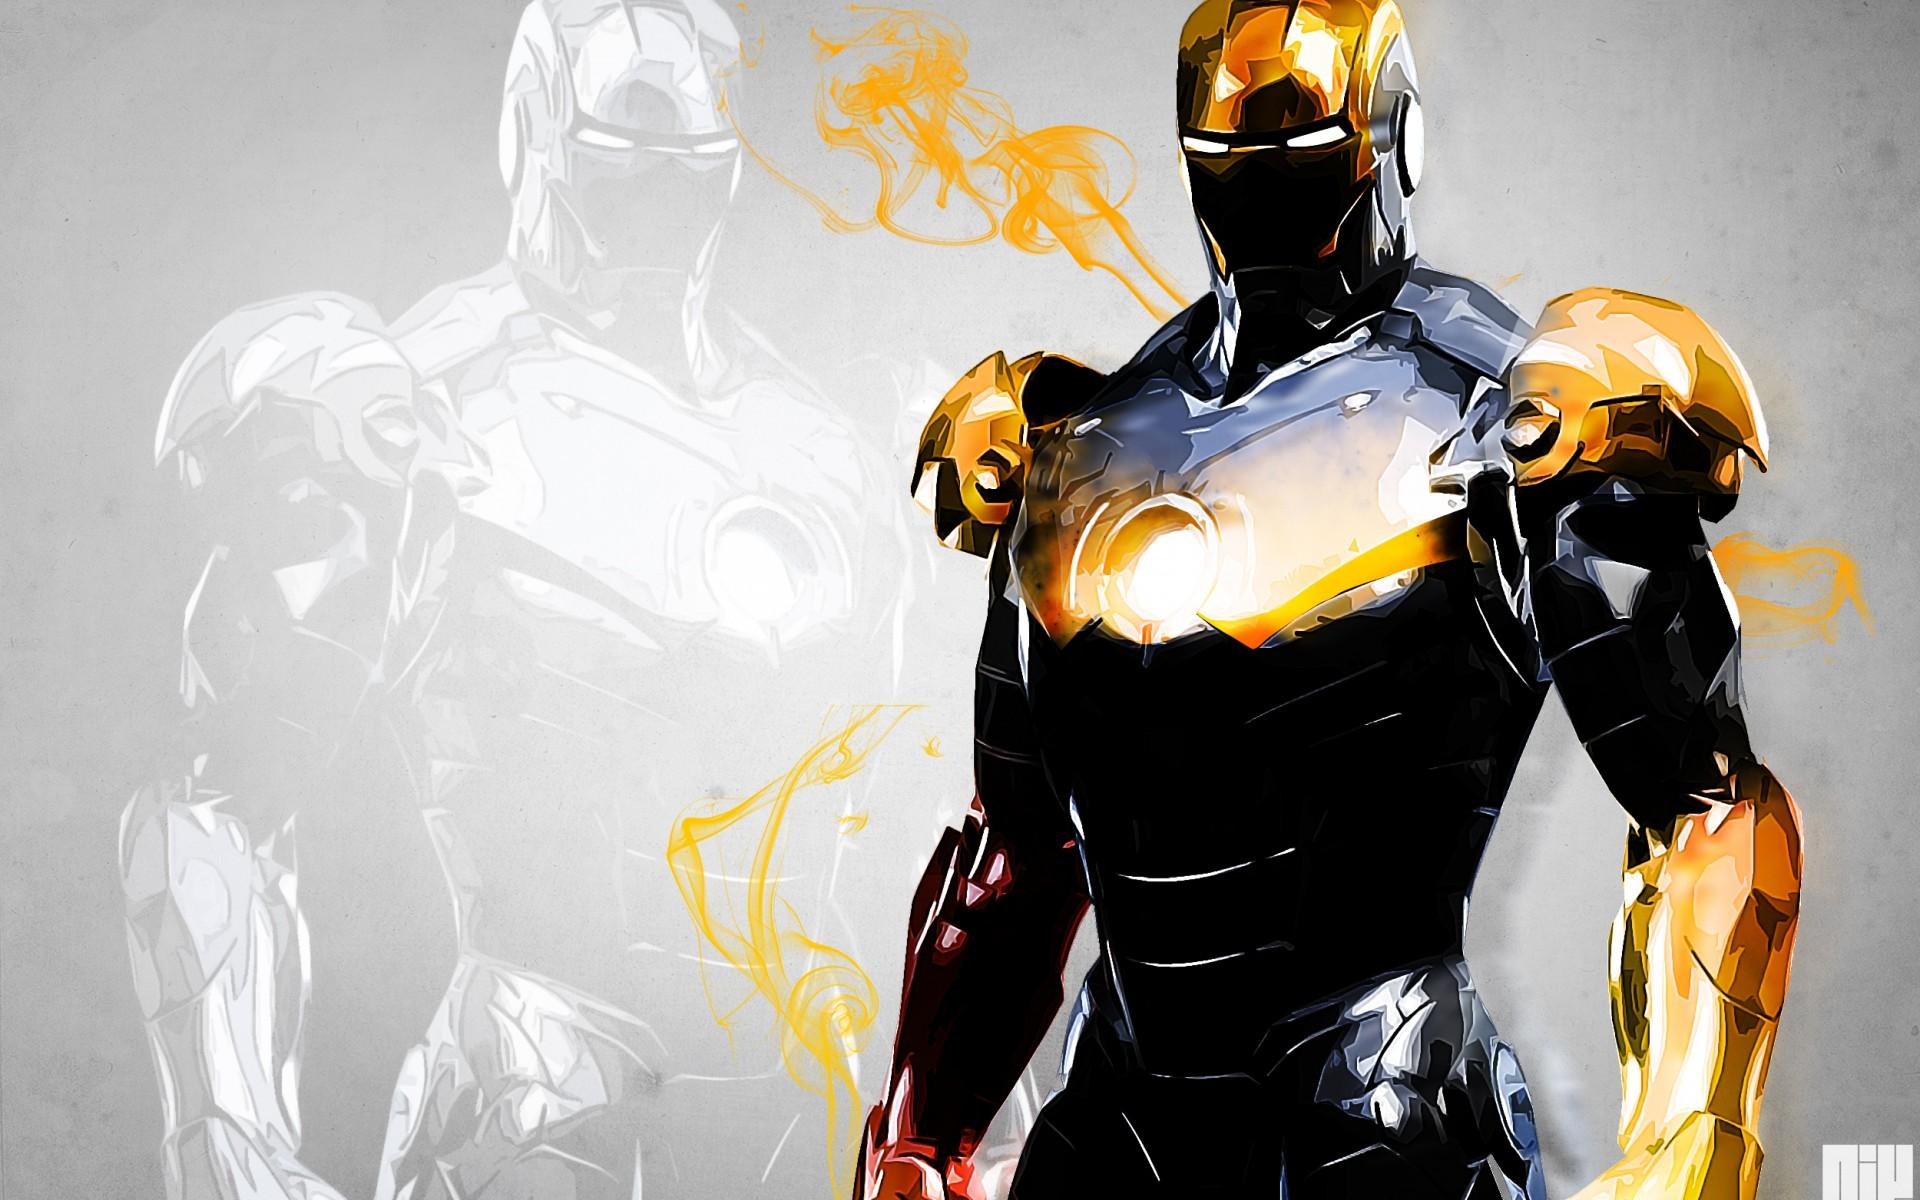 Iron man marvel comics superhero wallpaper 1920x1200 84804 1920x1200